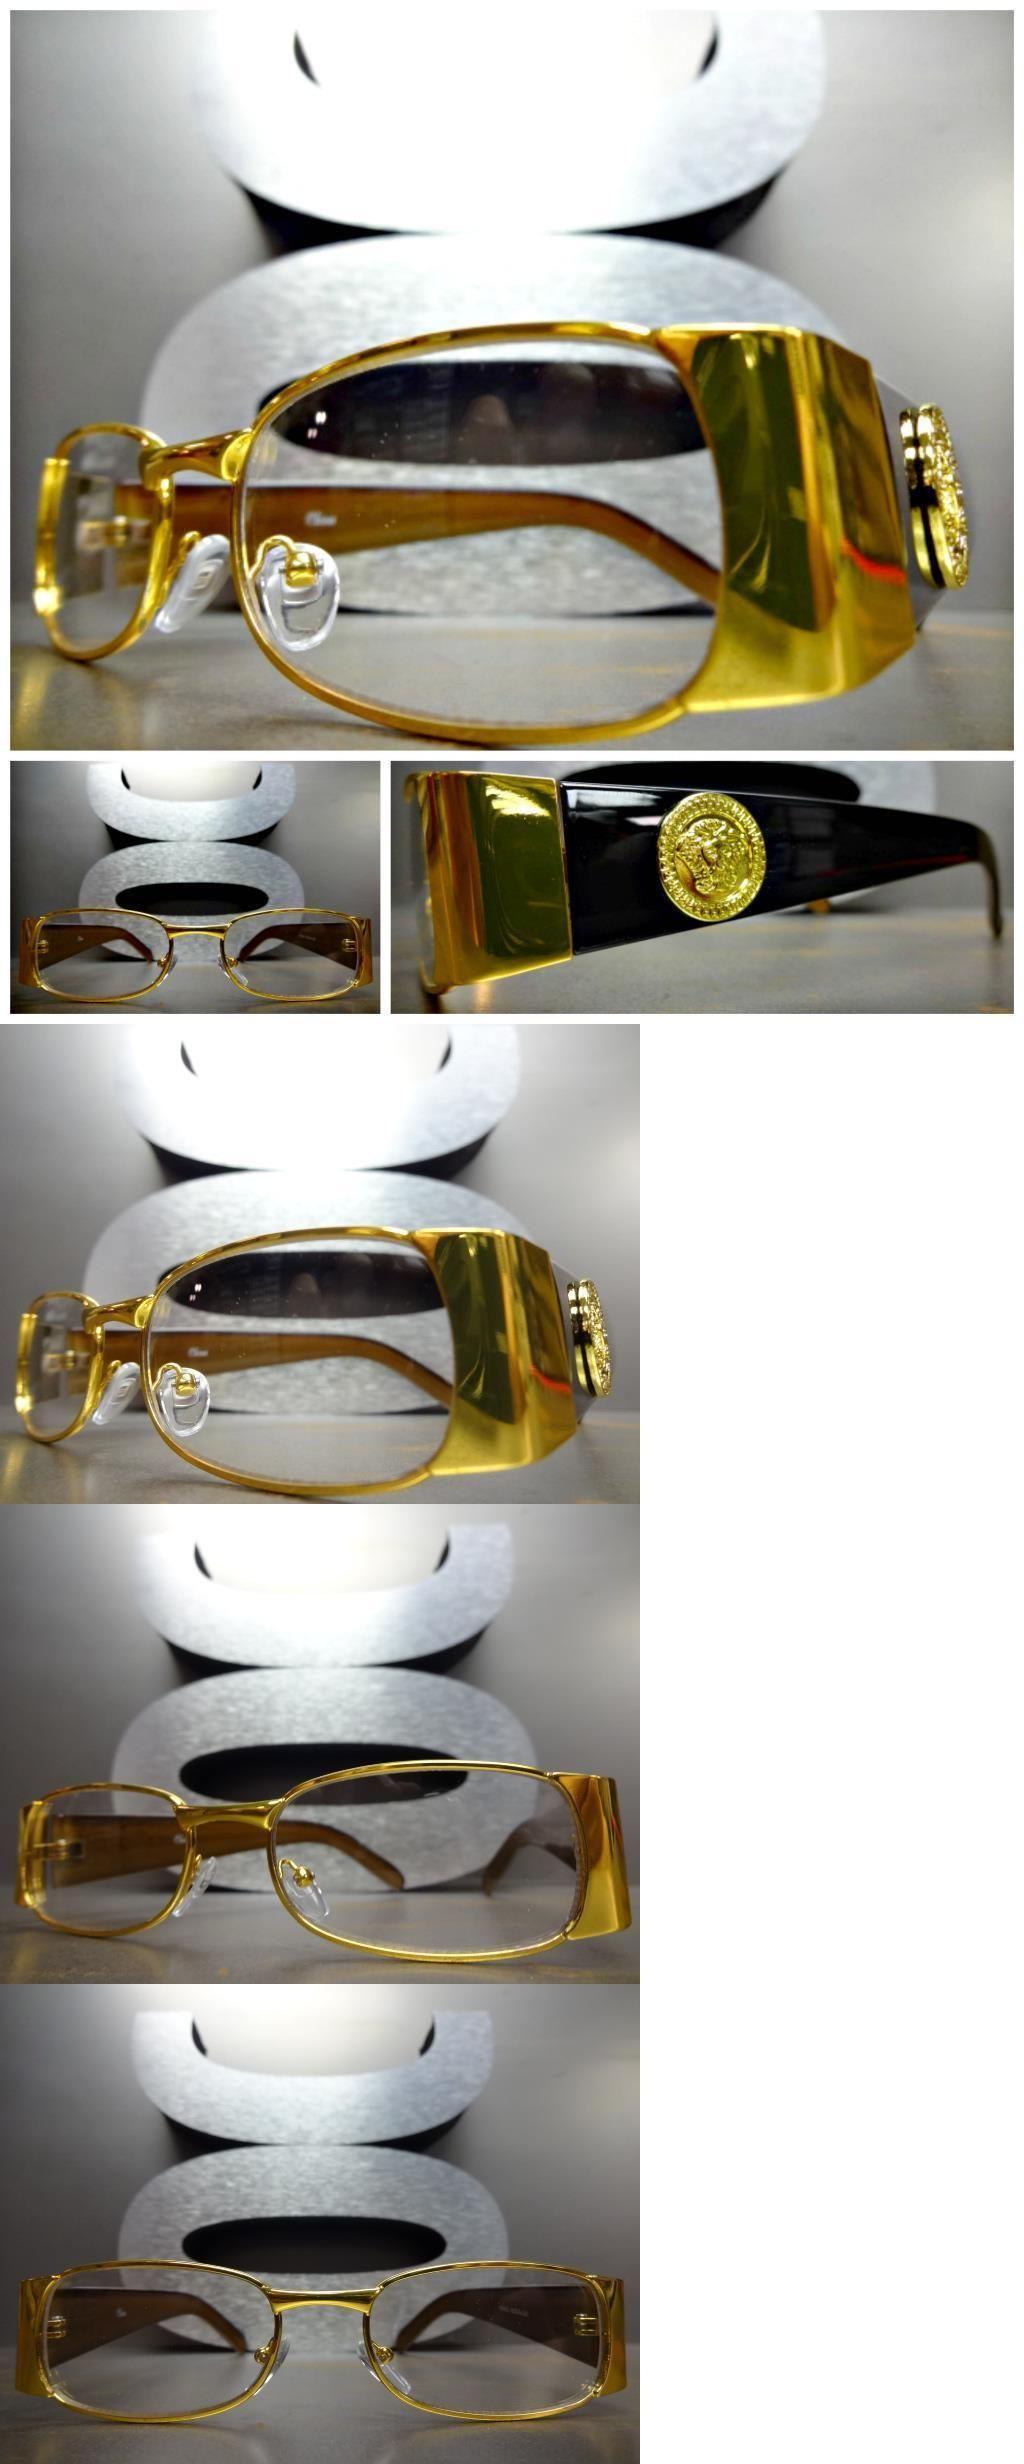 32c0ff44177 Fashion Eyewear Clear Glasses 179240  Mens Classic Vintage Retro Style  Clear Lens Eye Glasses Gold Black Fashion Frame -  BUY IT NOW ONLY   699.99  on eBay!